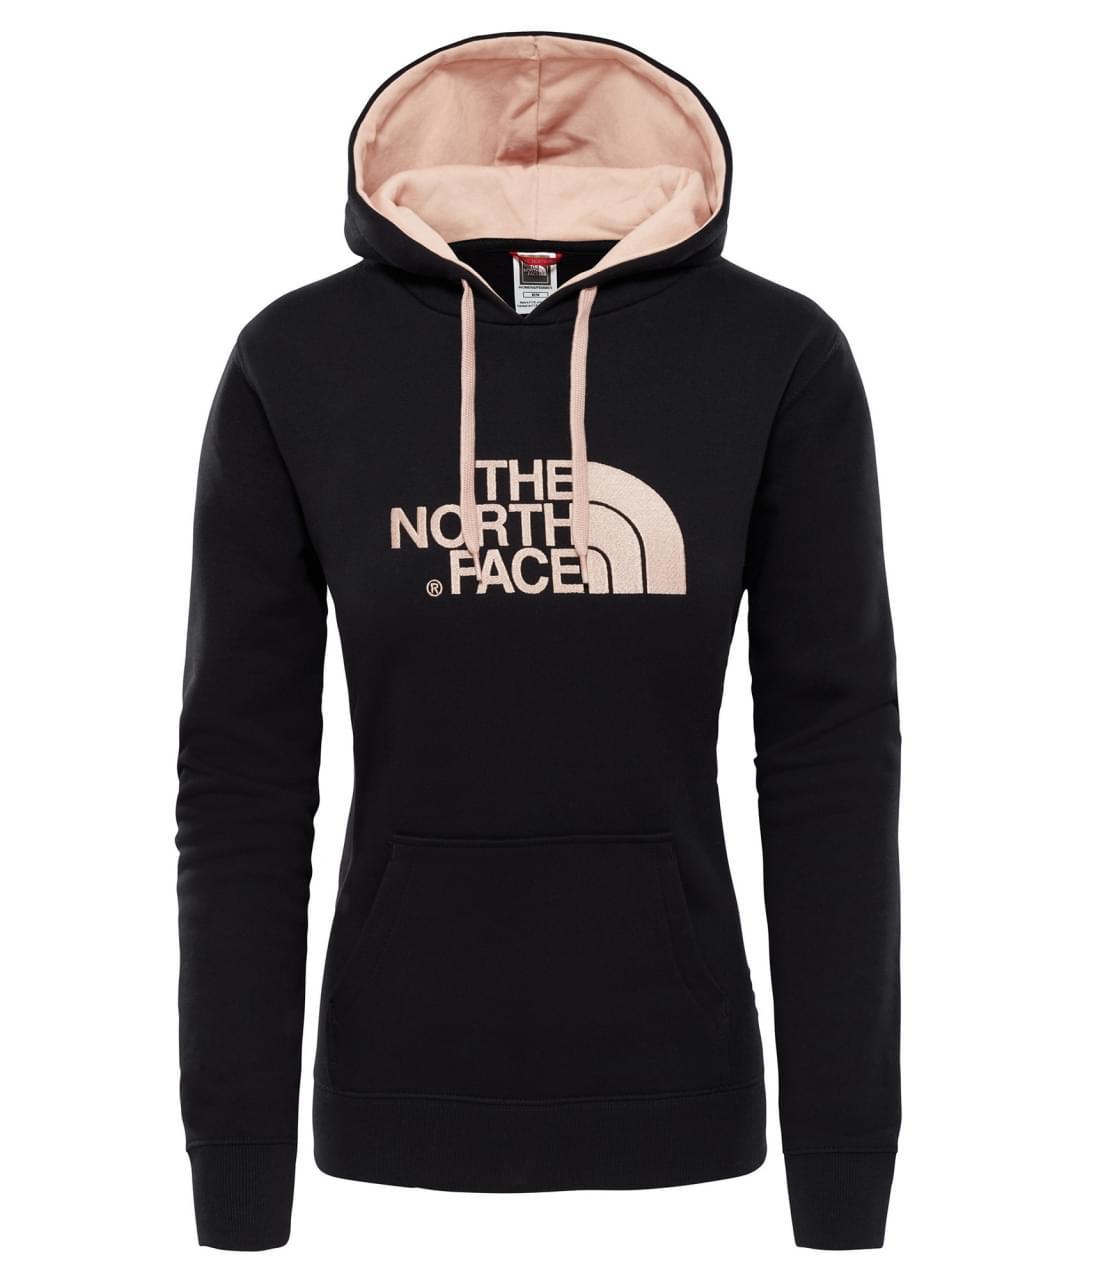 The North Face Drew Peak Pullover Hoodie Trui Dames